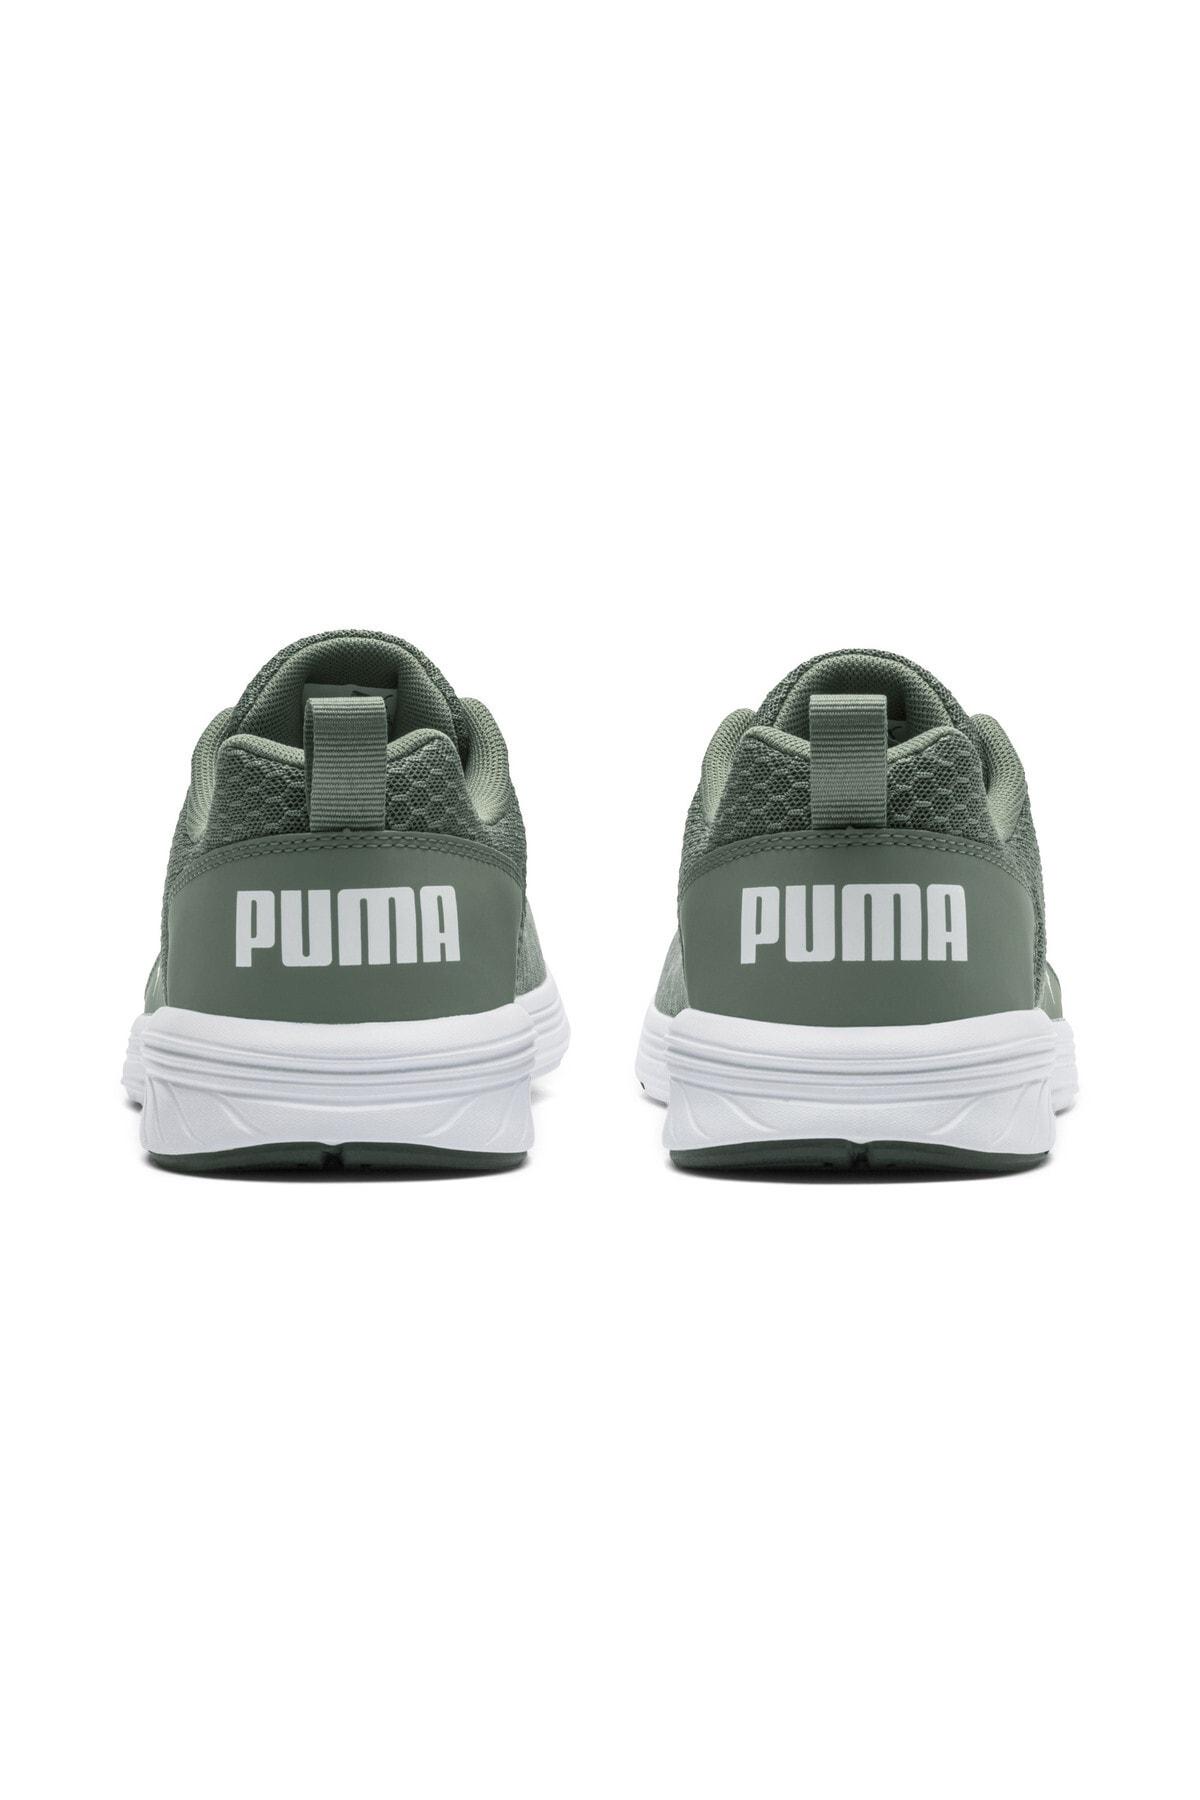 Puma NRGY Comet Koşu Ayakkabısı 2